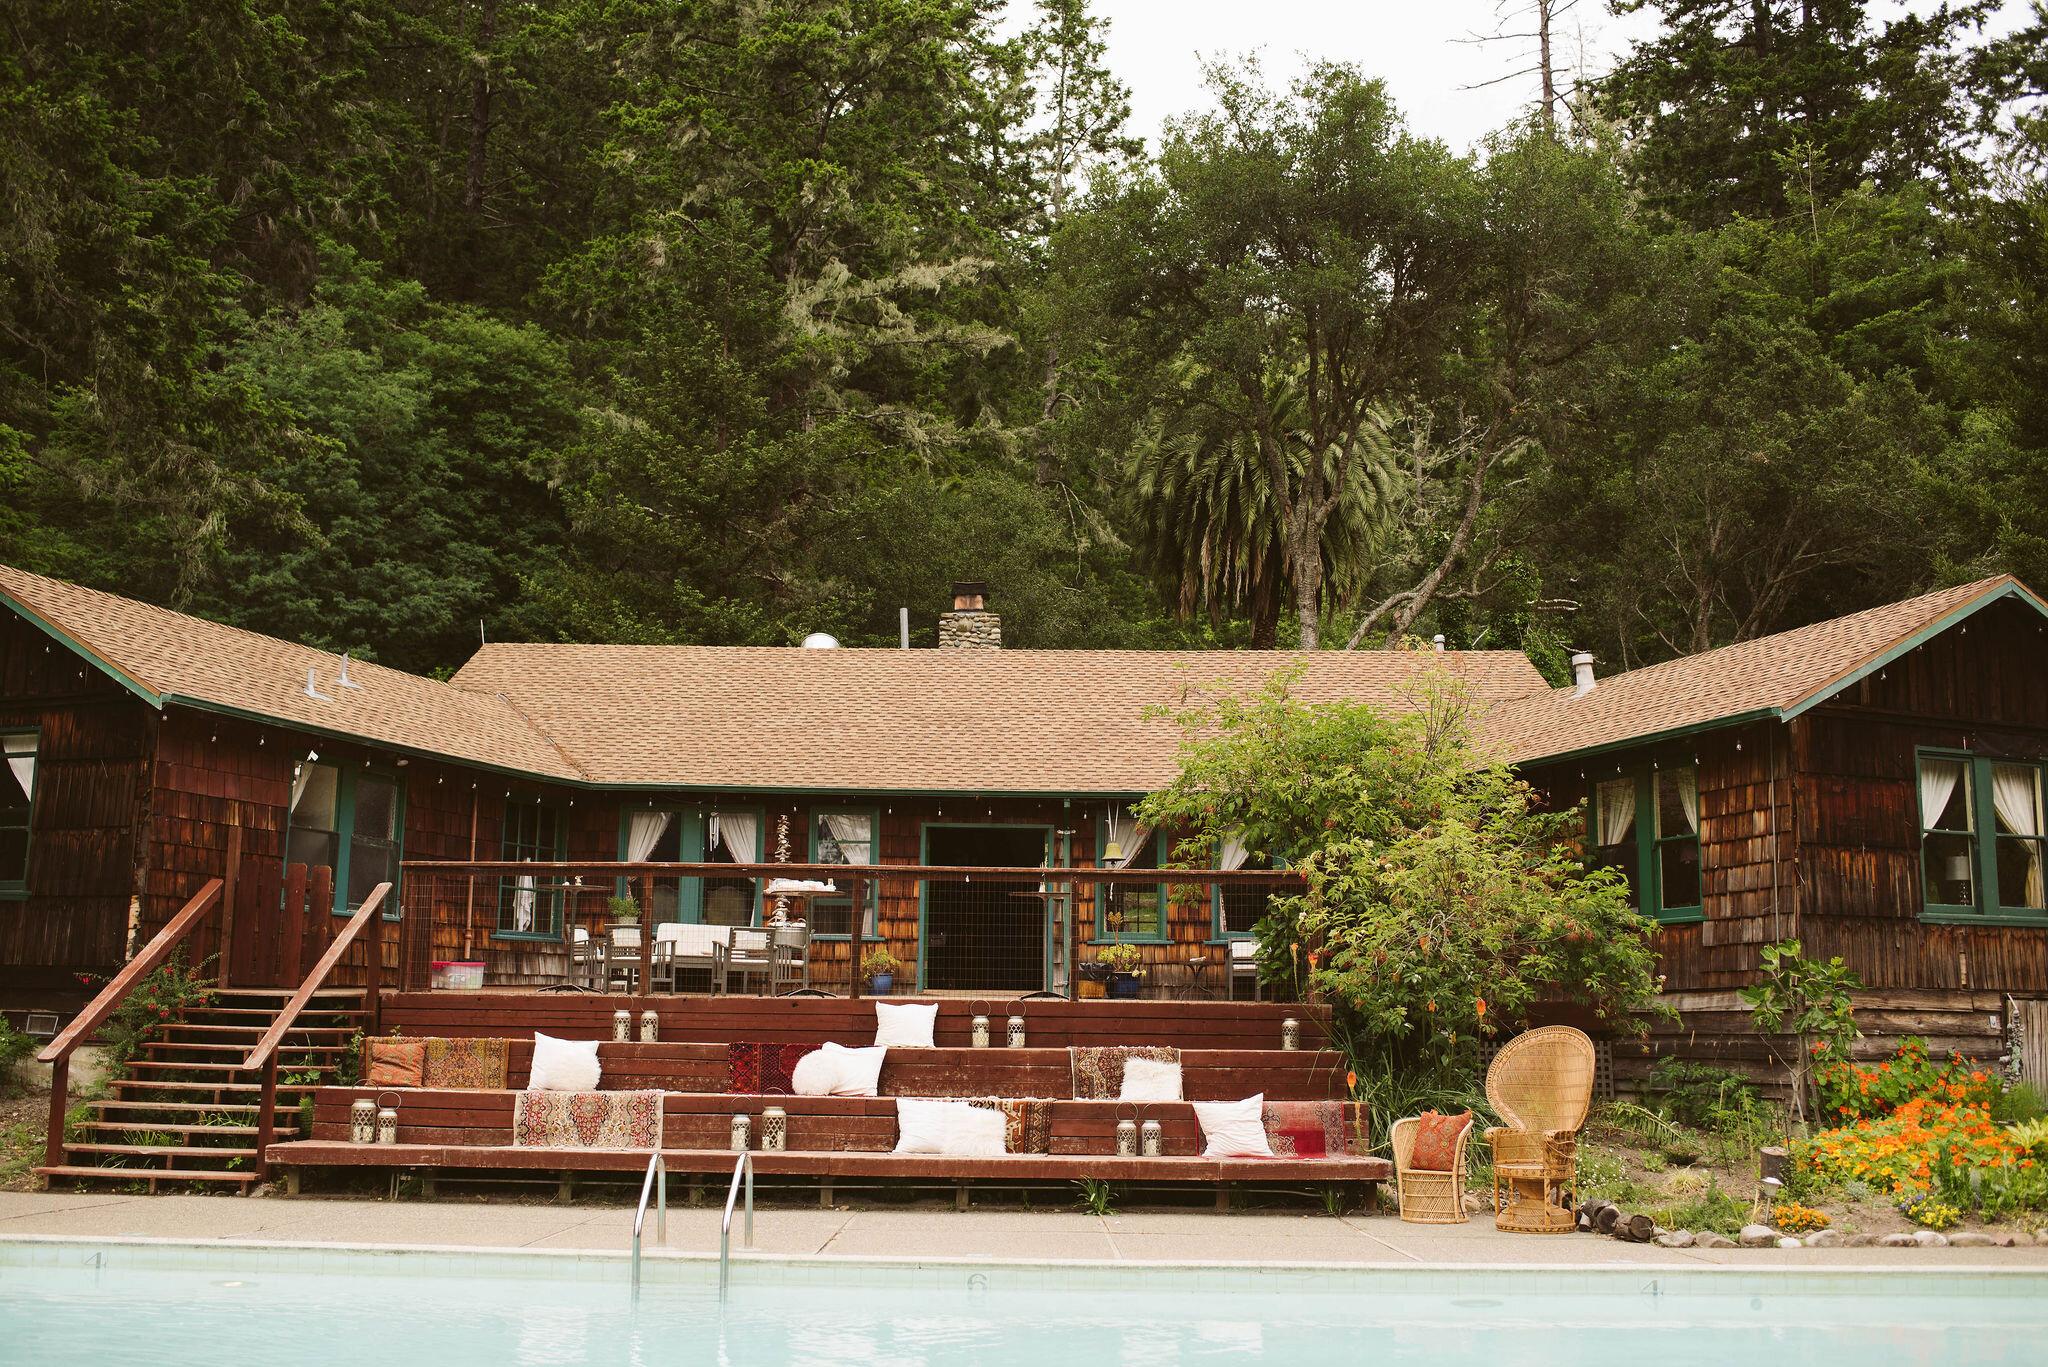 Venture-Retreat-Center-Wedding-Pescadero-Sat-Aaron-Pritam-The-Shalom-Imaginative-3.jpg